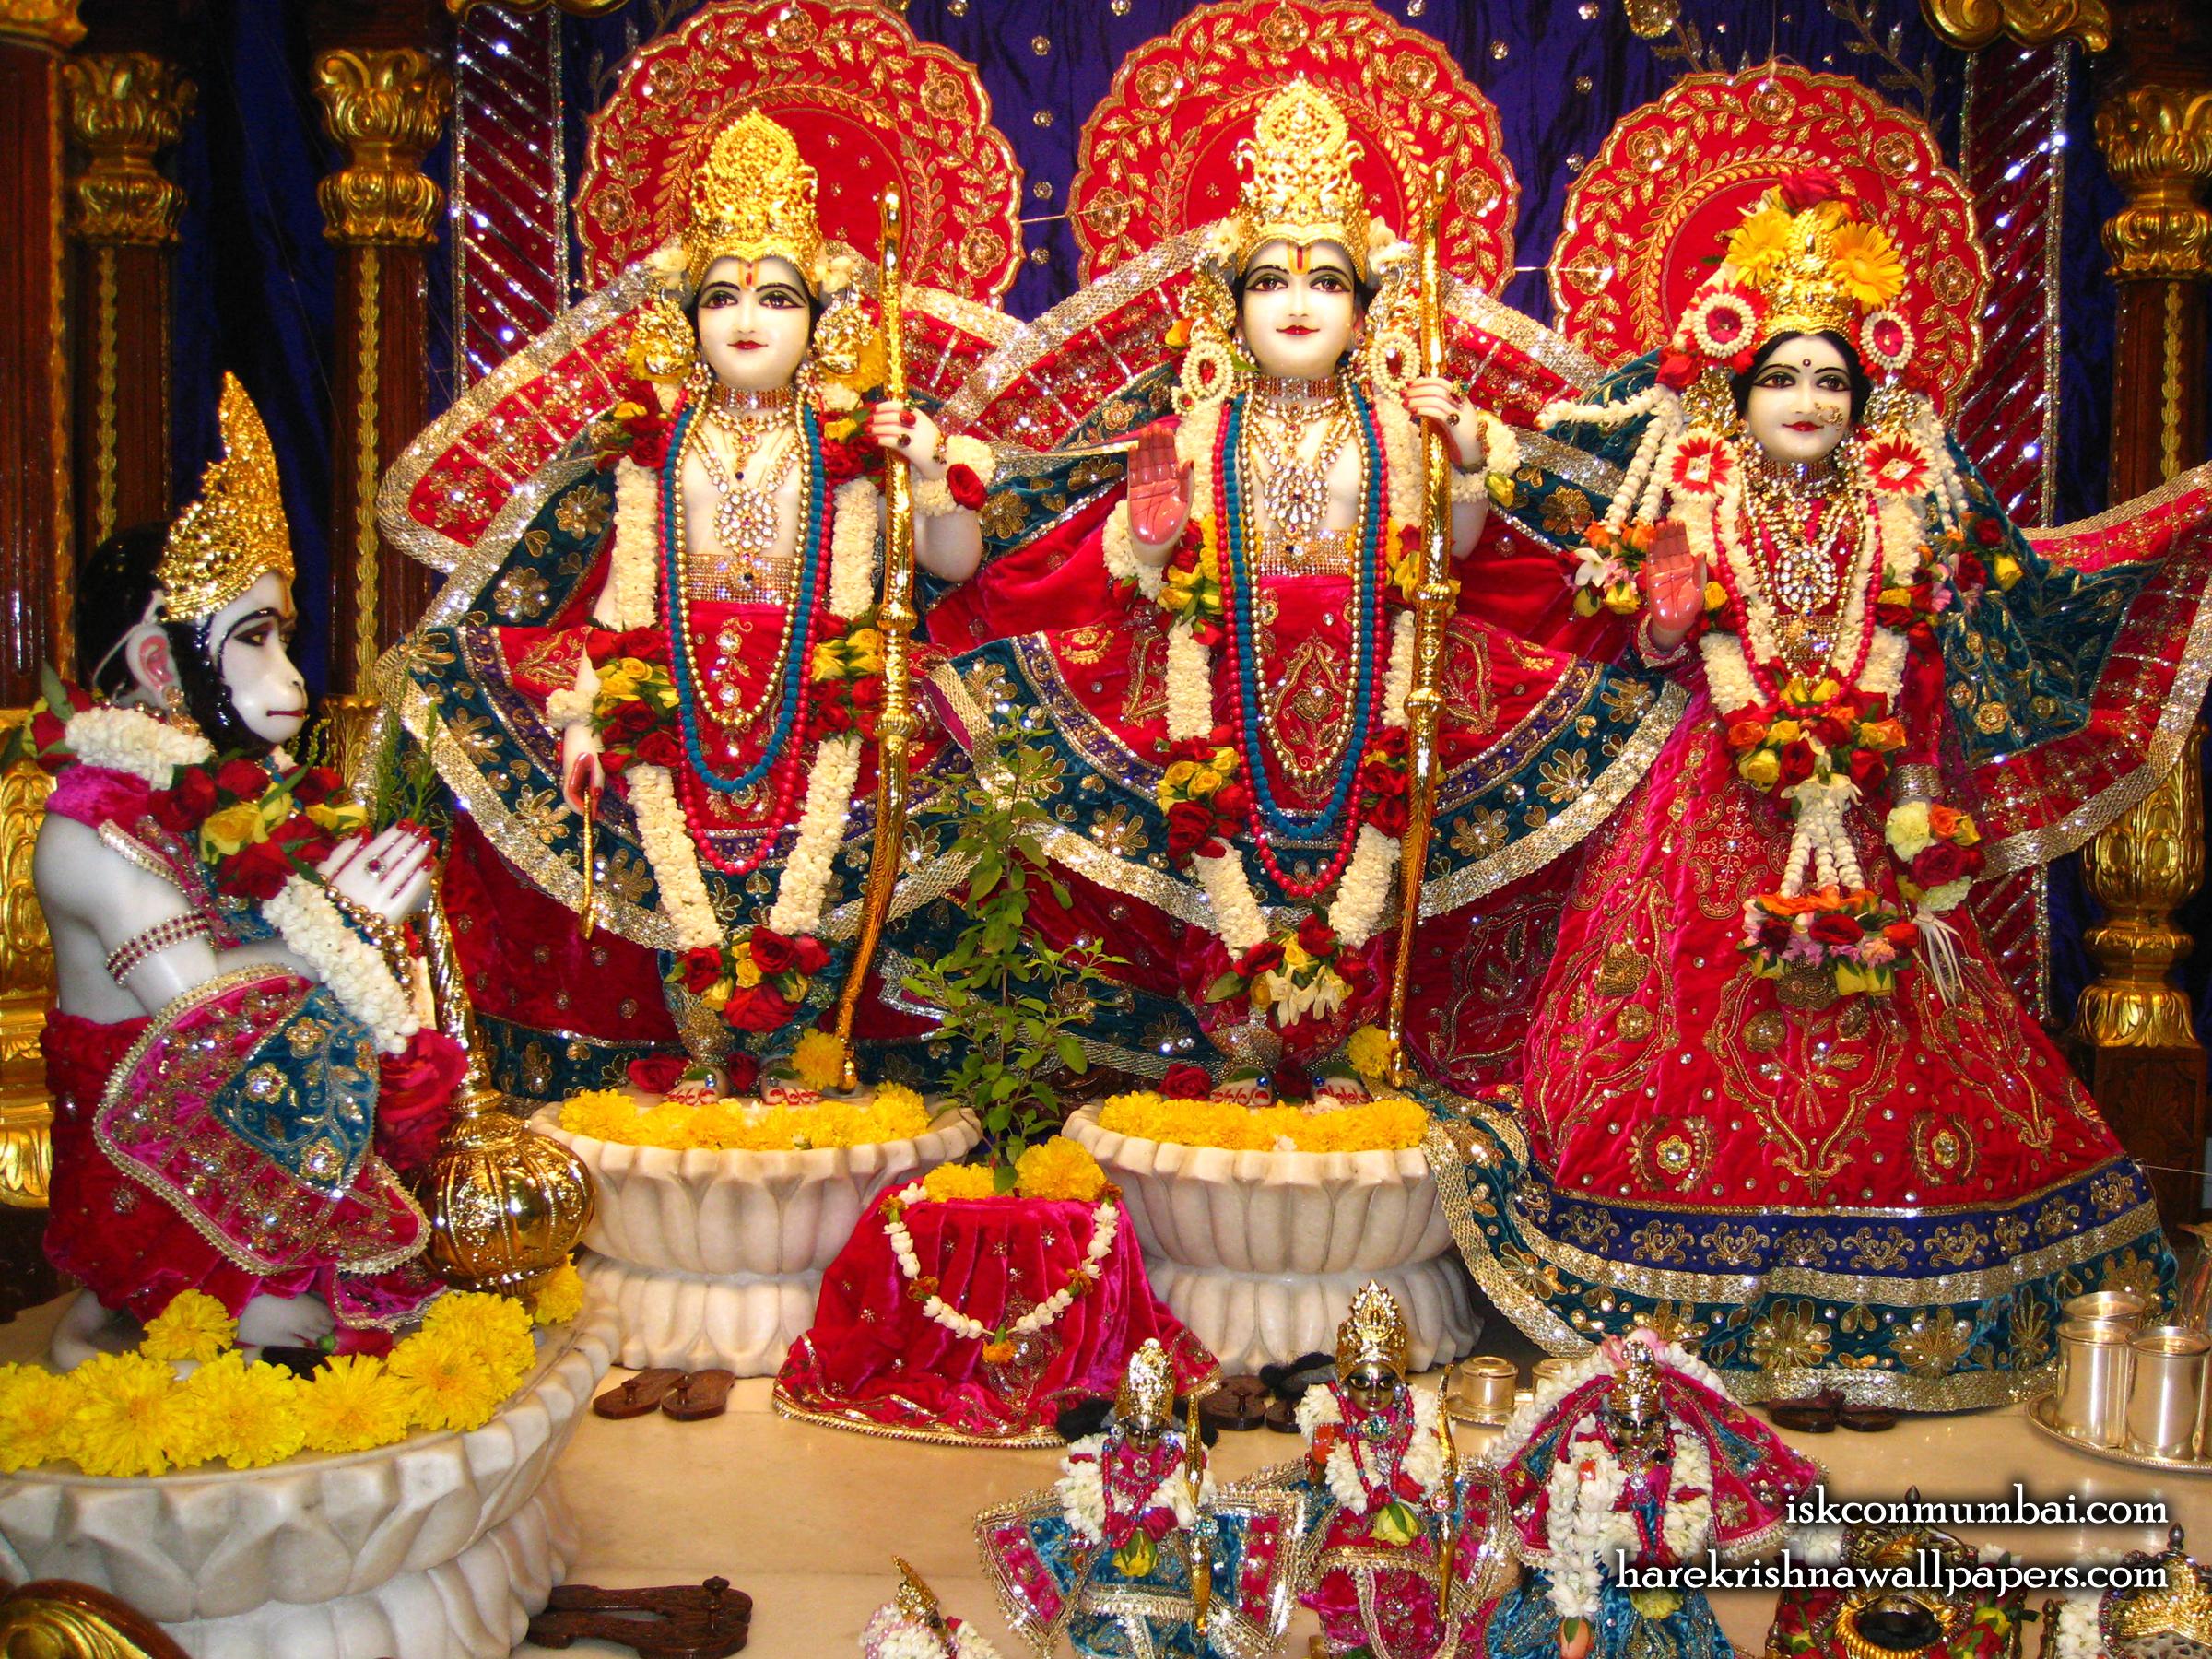 Sri Sri Sita Rama Laxman Hanuman Wallpaper (003) Size 2400x1800 Download